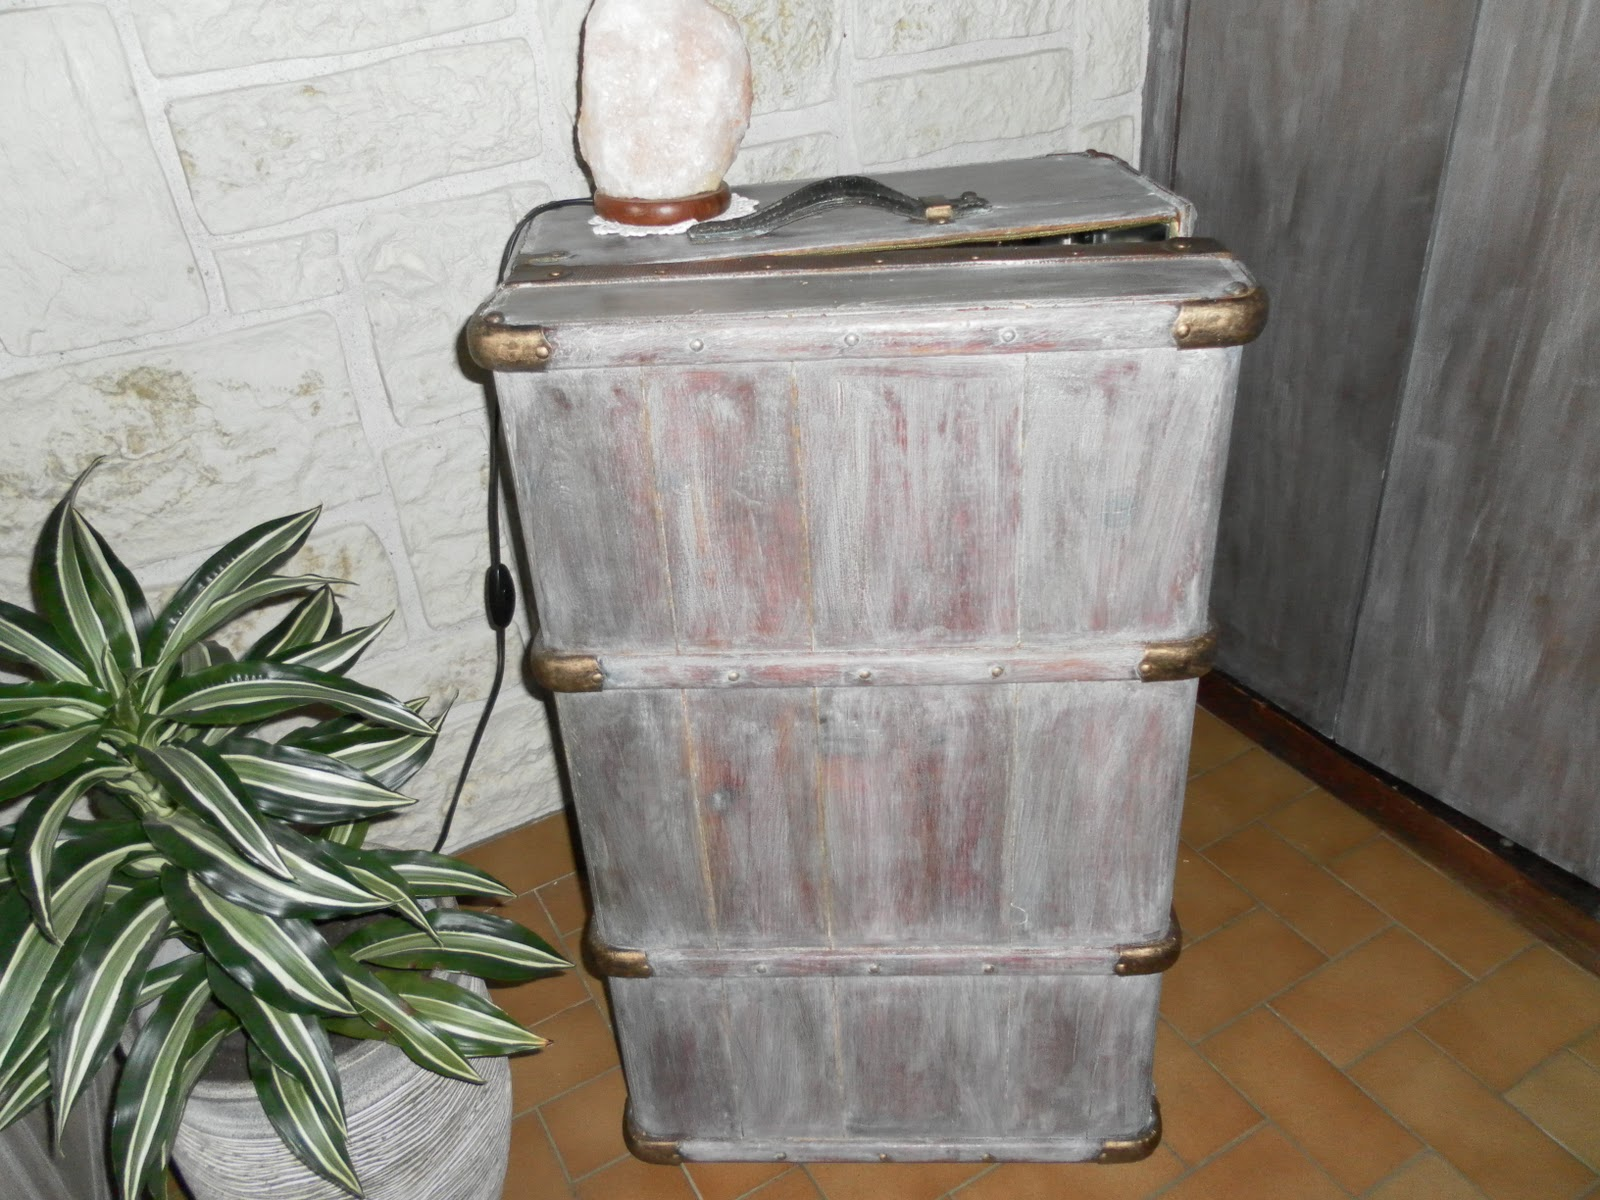 la d co d 39 isa une valise en bois. Black Bedroom Furniture Sets. Home Design Ideas